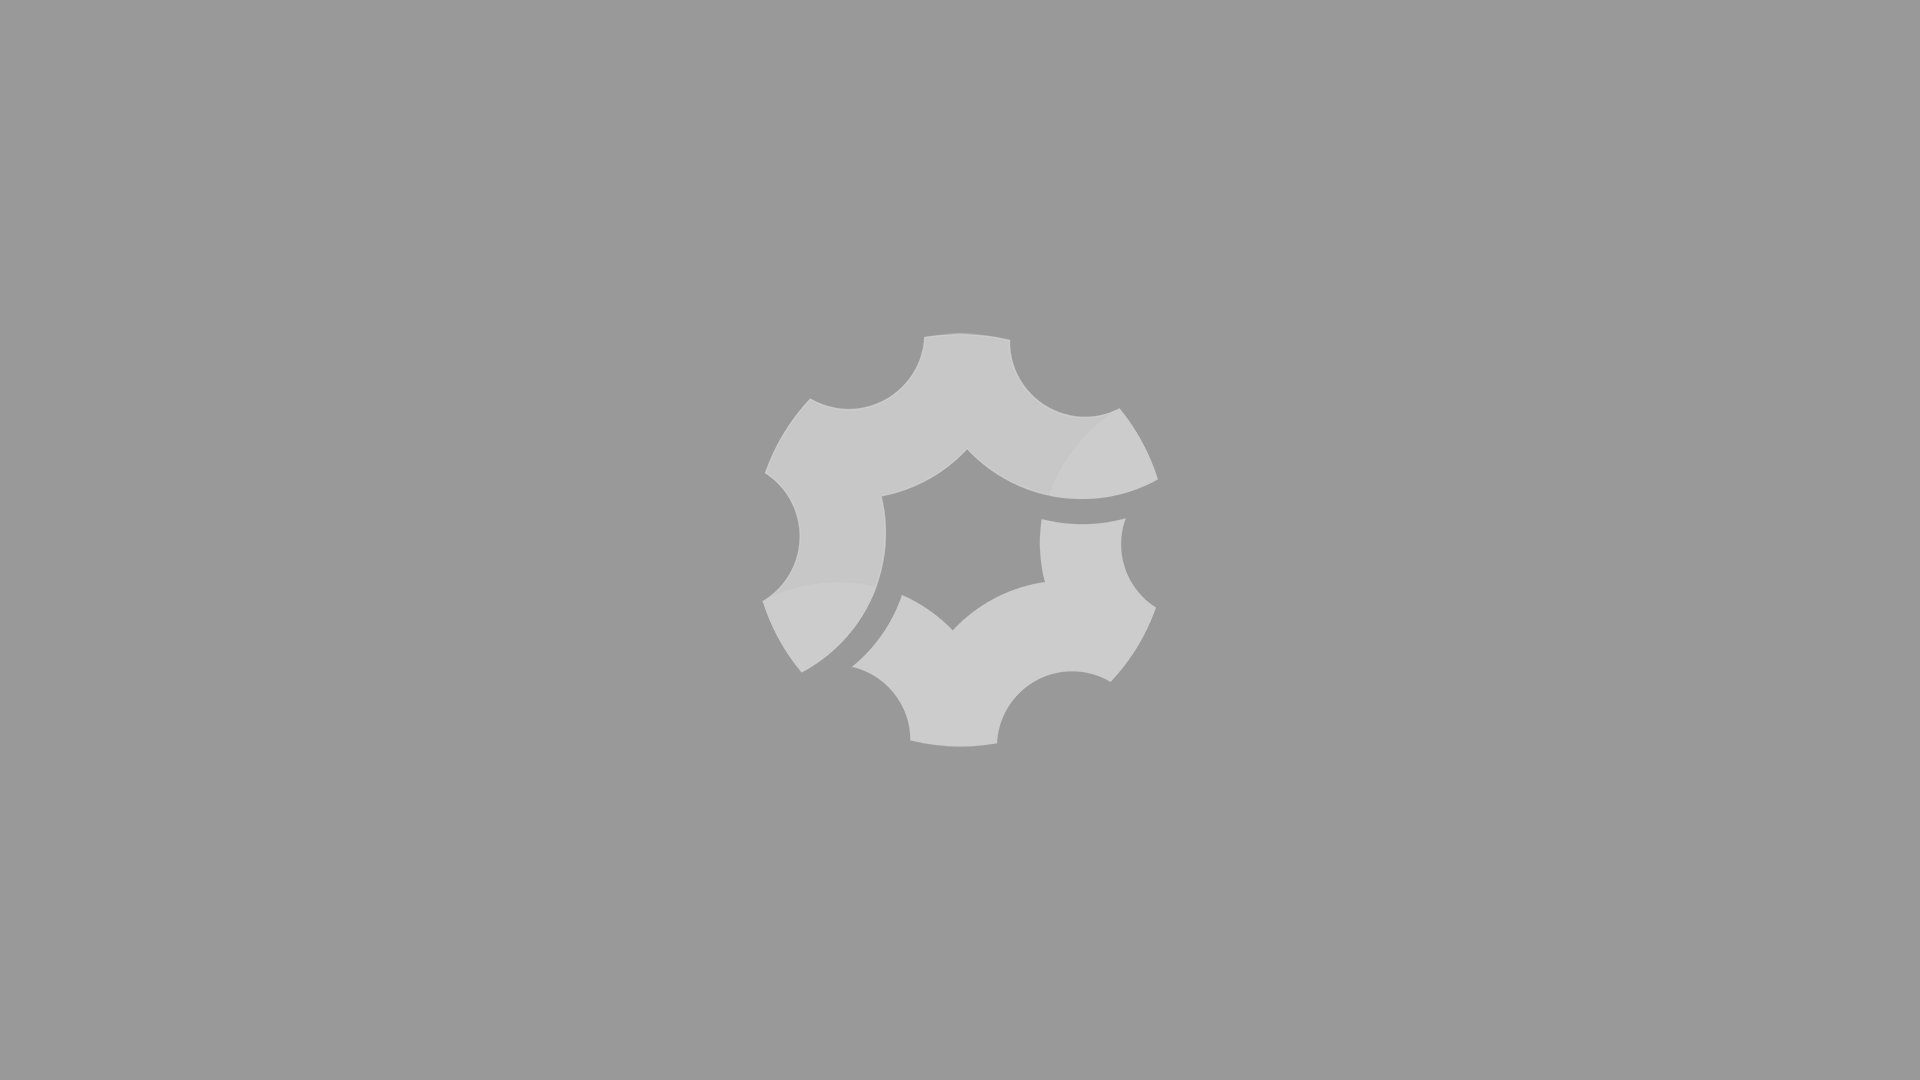 board-logo-wood-used-xl.png